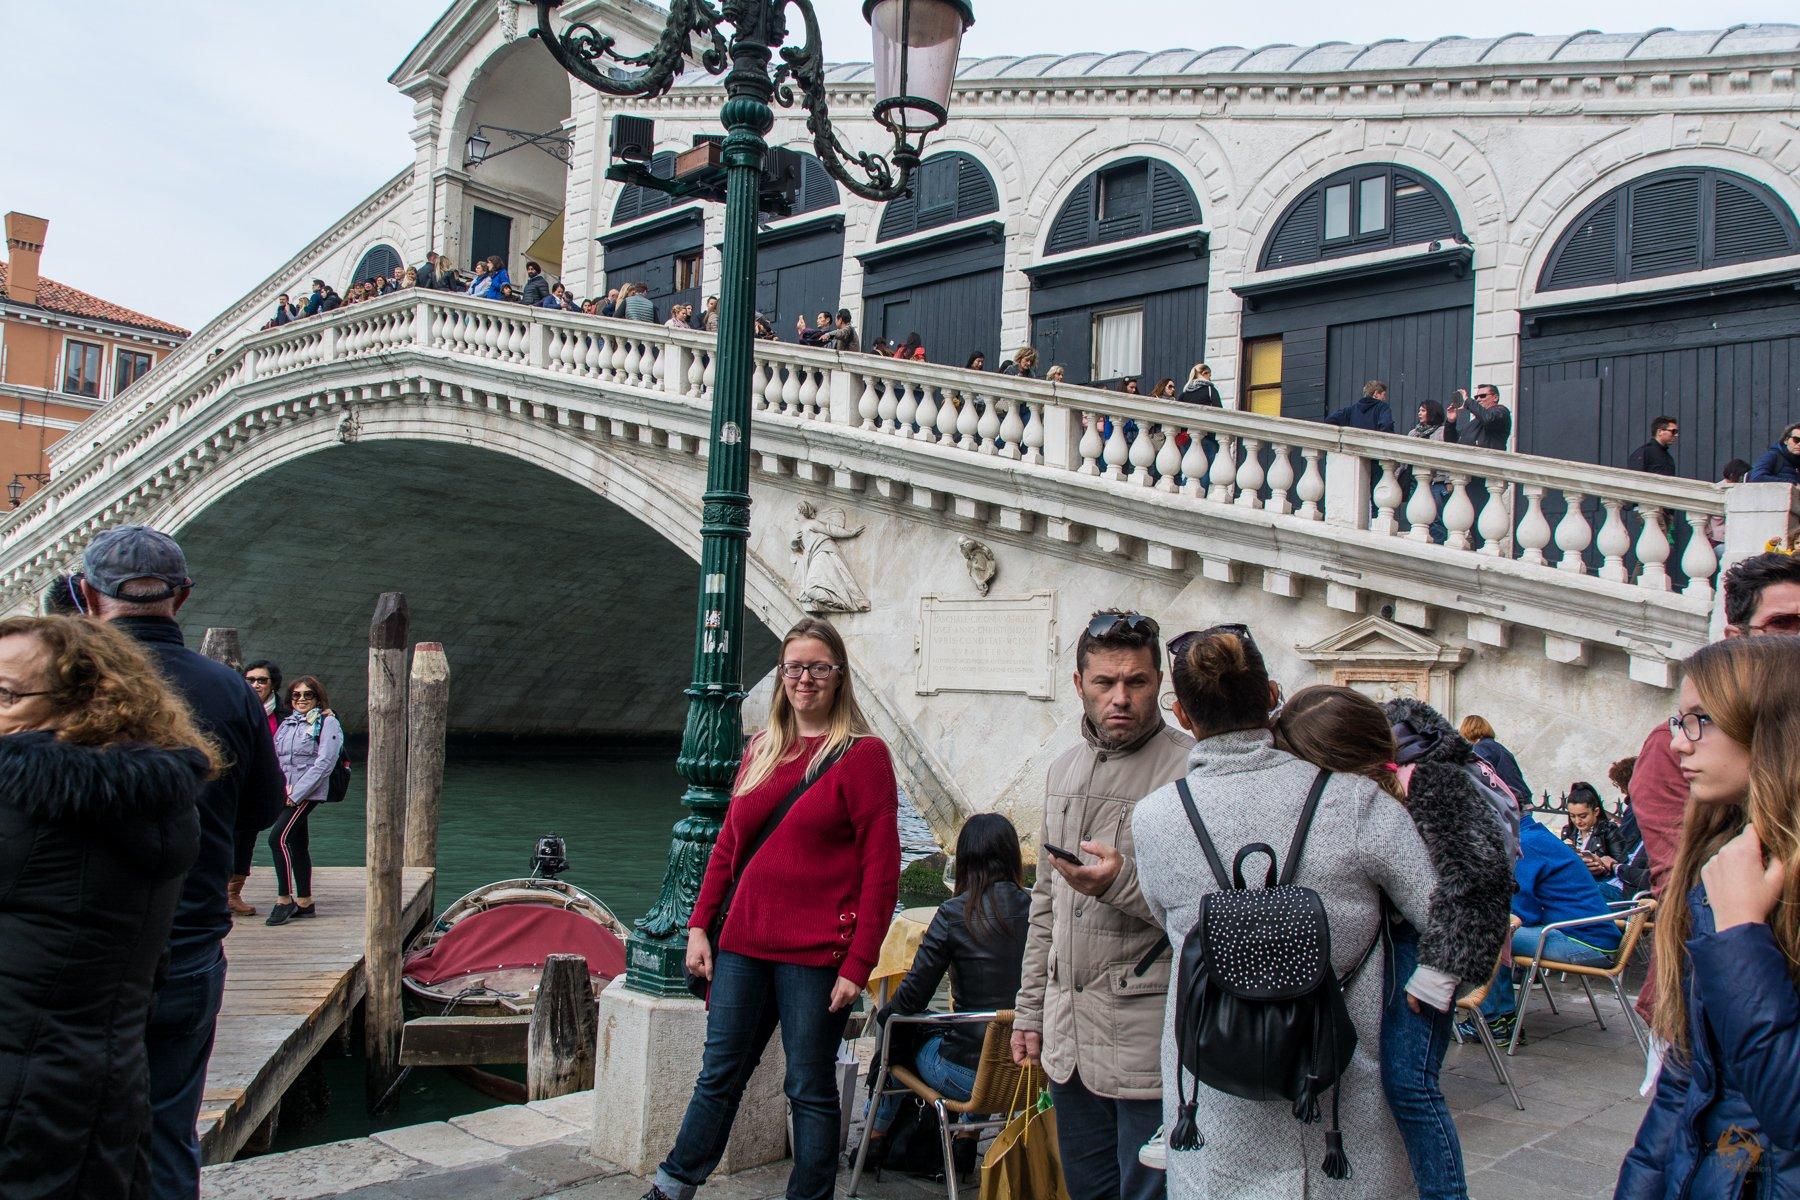 vor der Rialtobrücke in Venedig - Italien